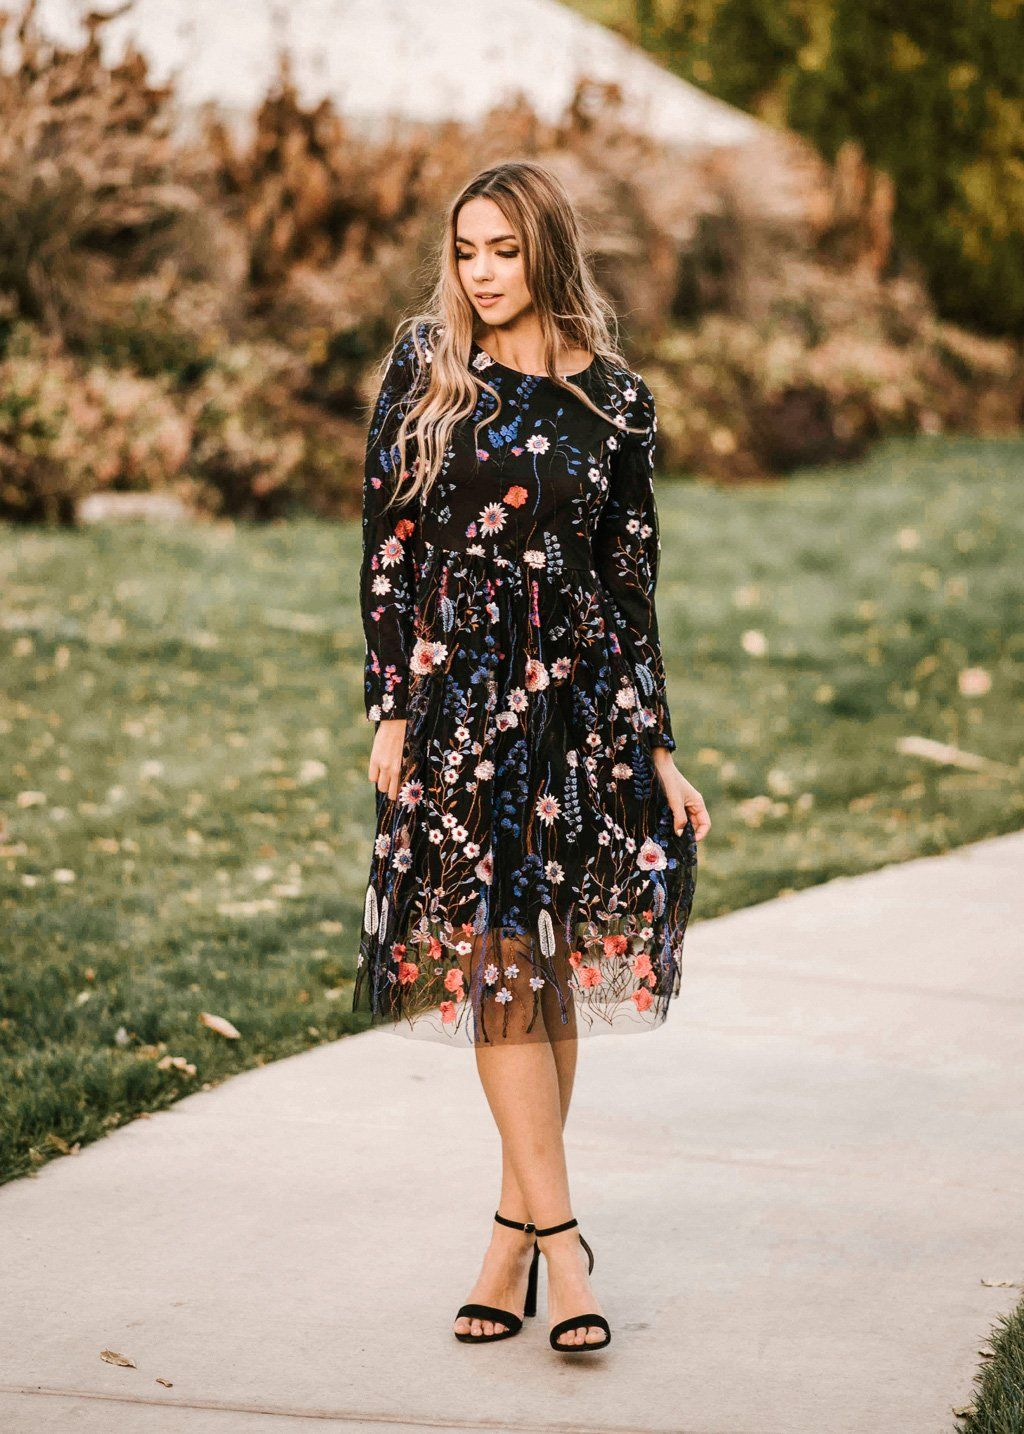 Fashion Fall foto dresses pictures rare photo